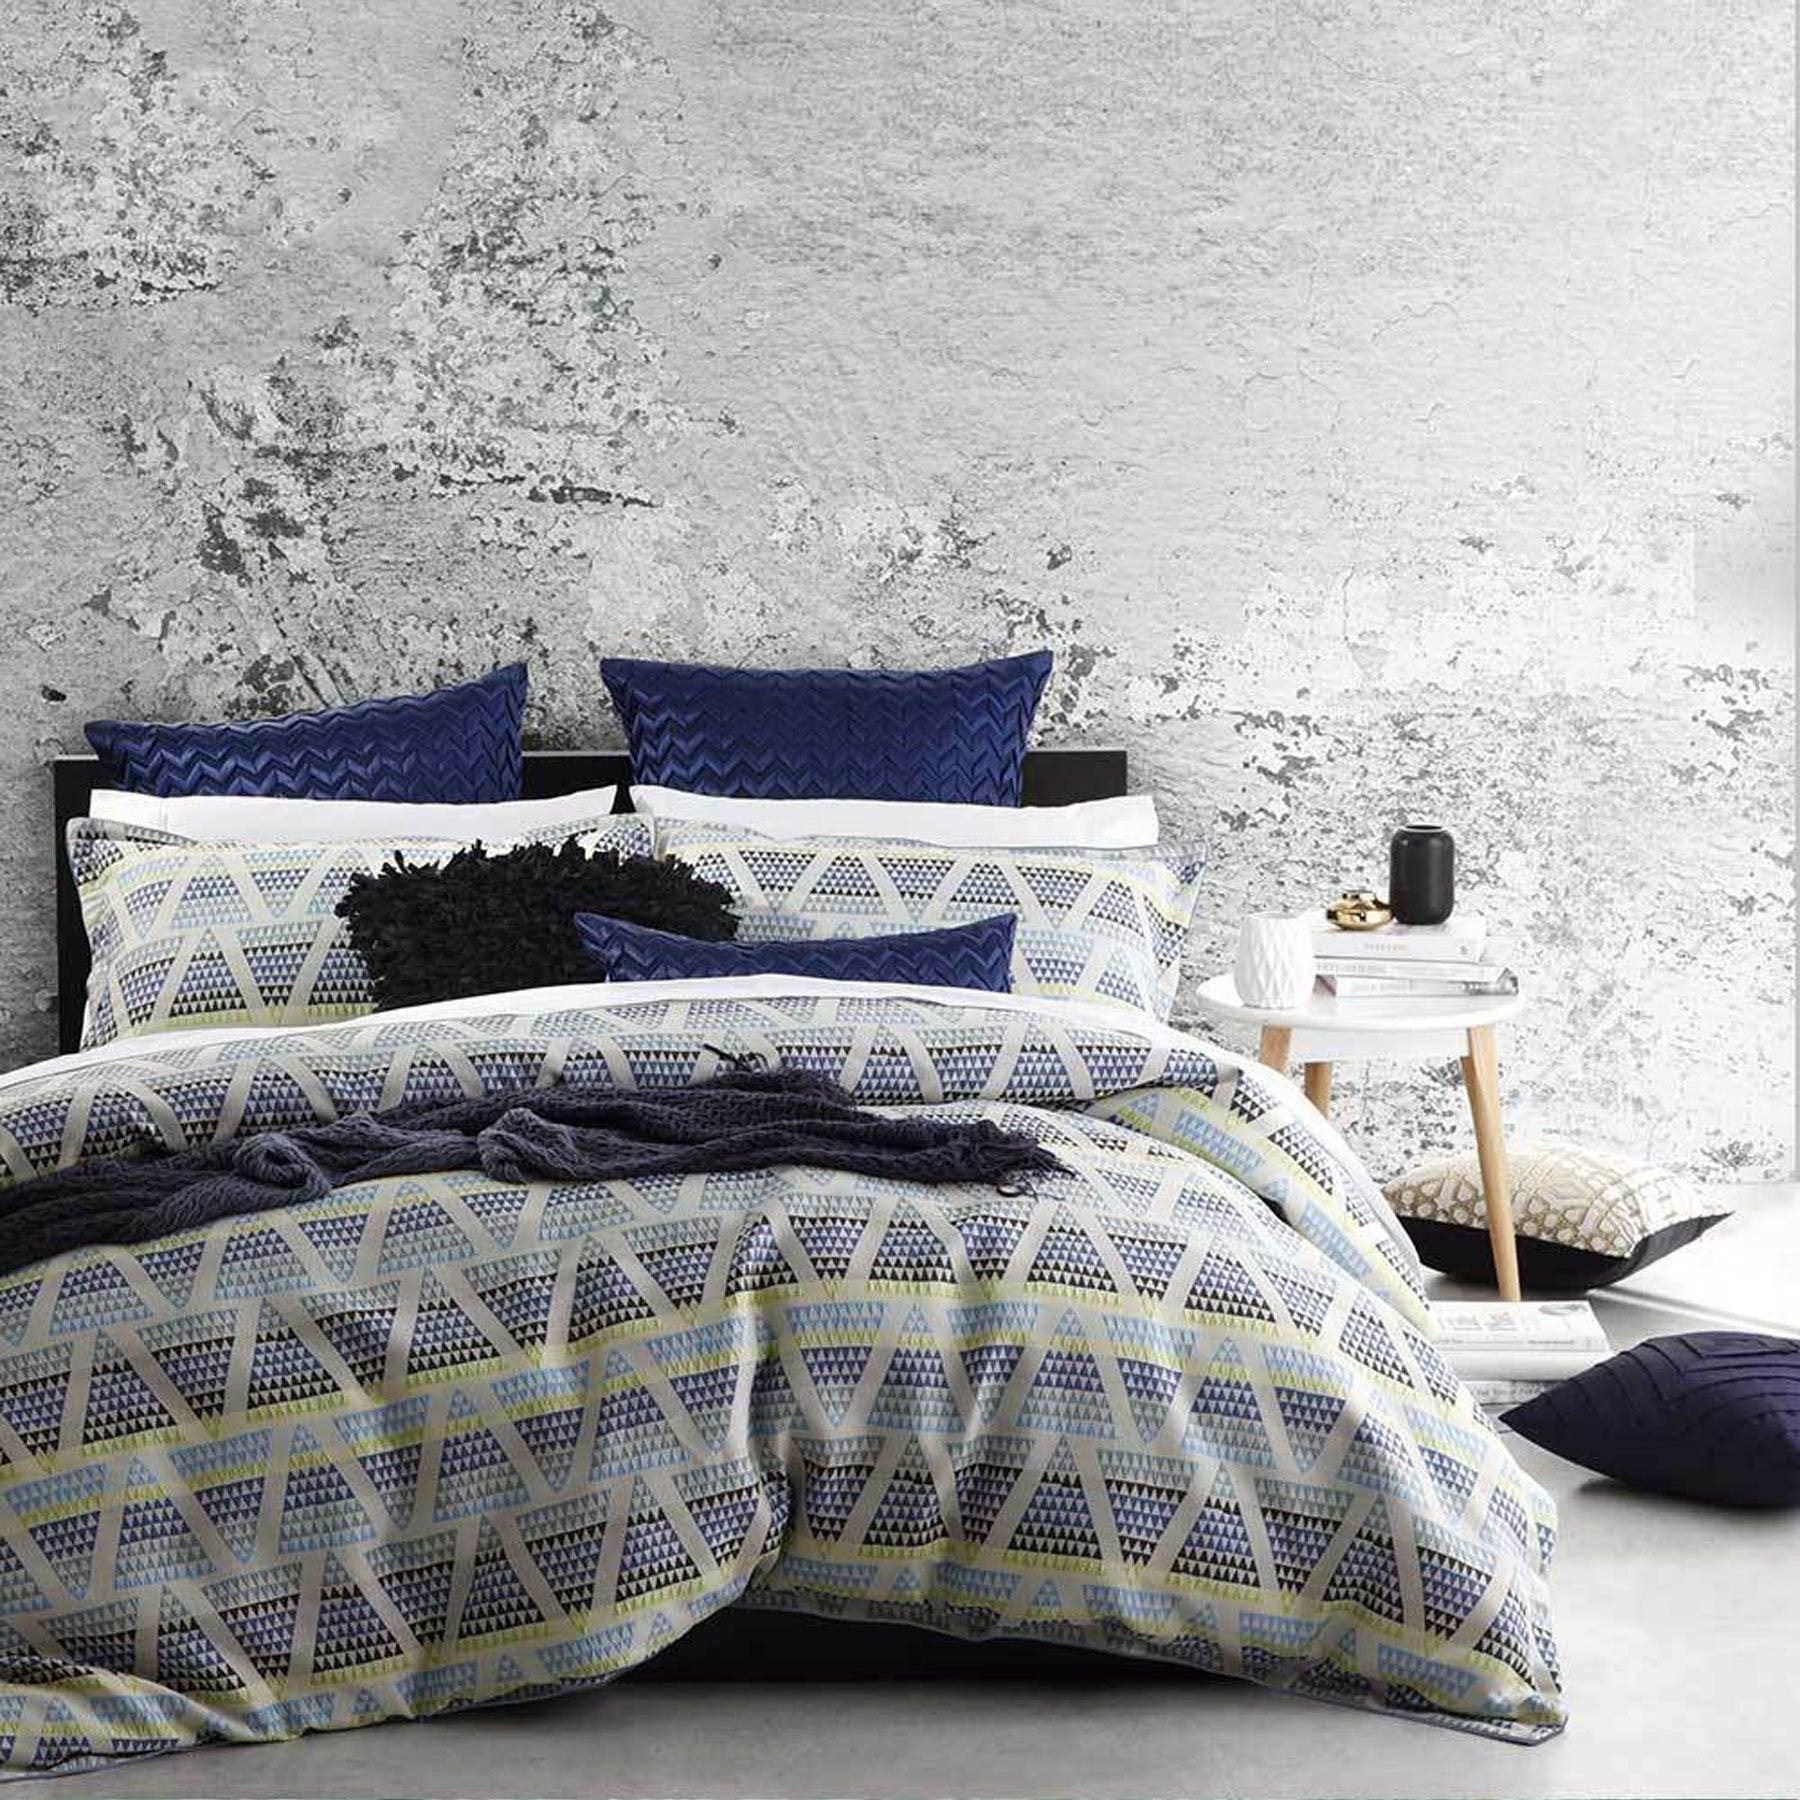 Zander Blue Quilt Cover Set King